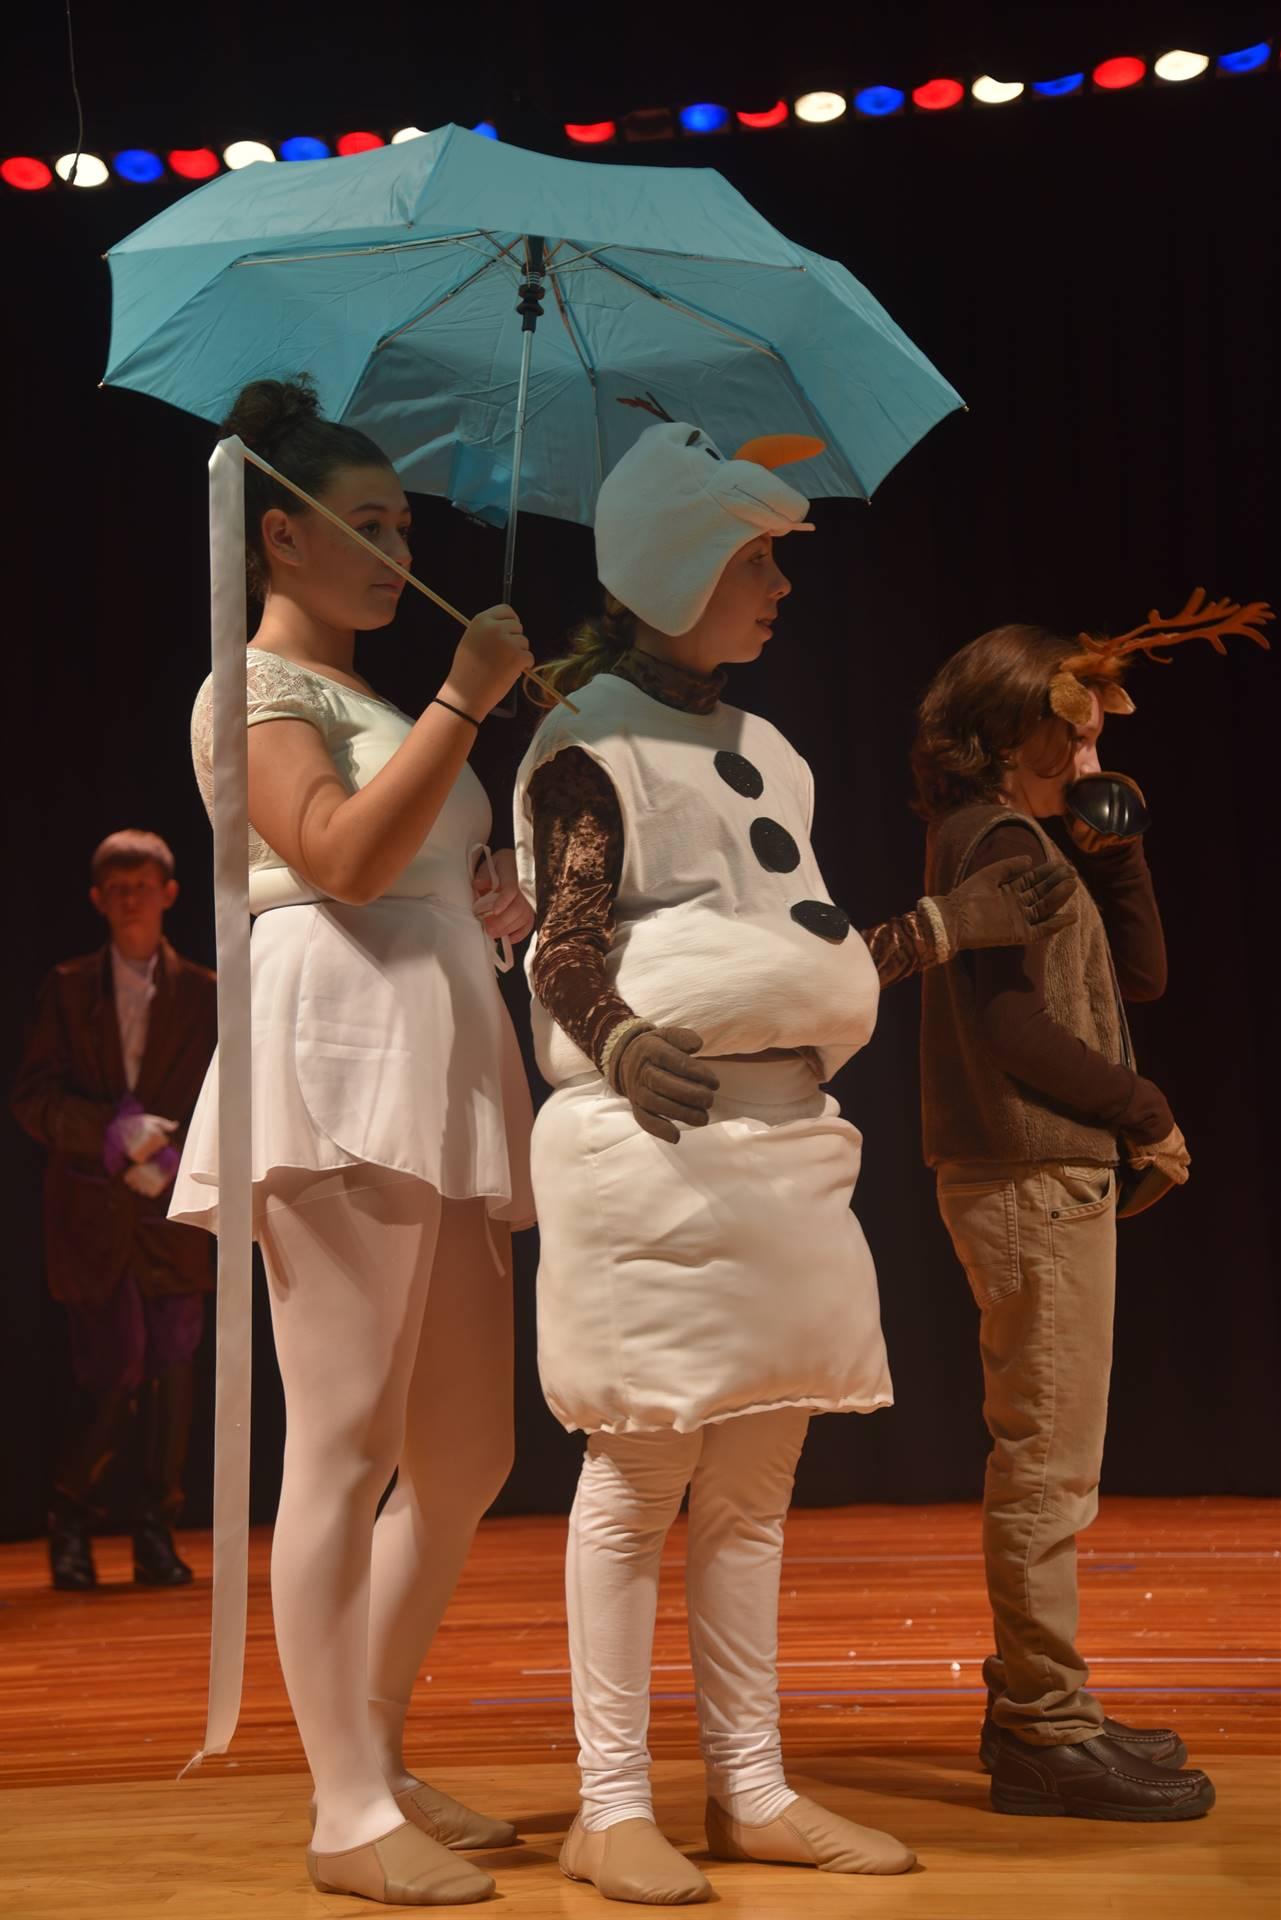 Olaf's Umbrella